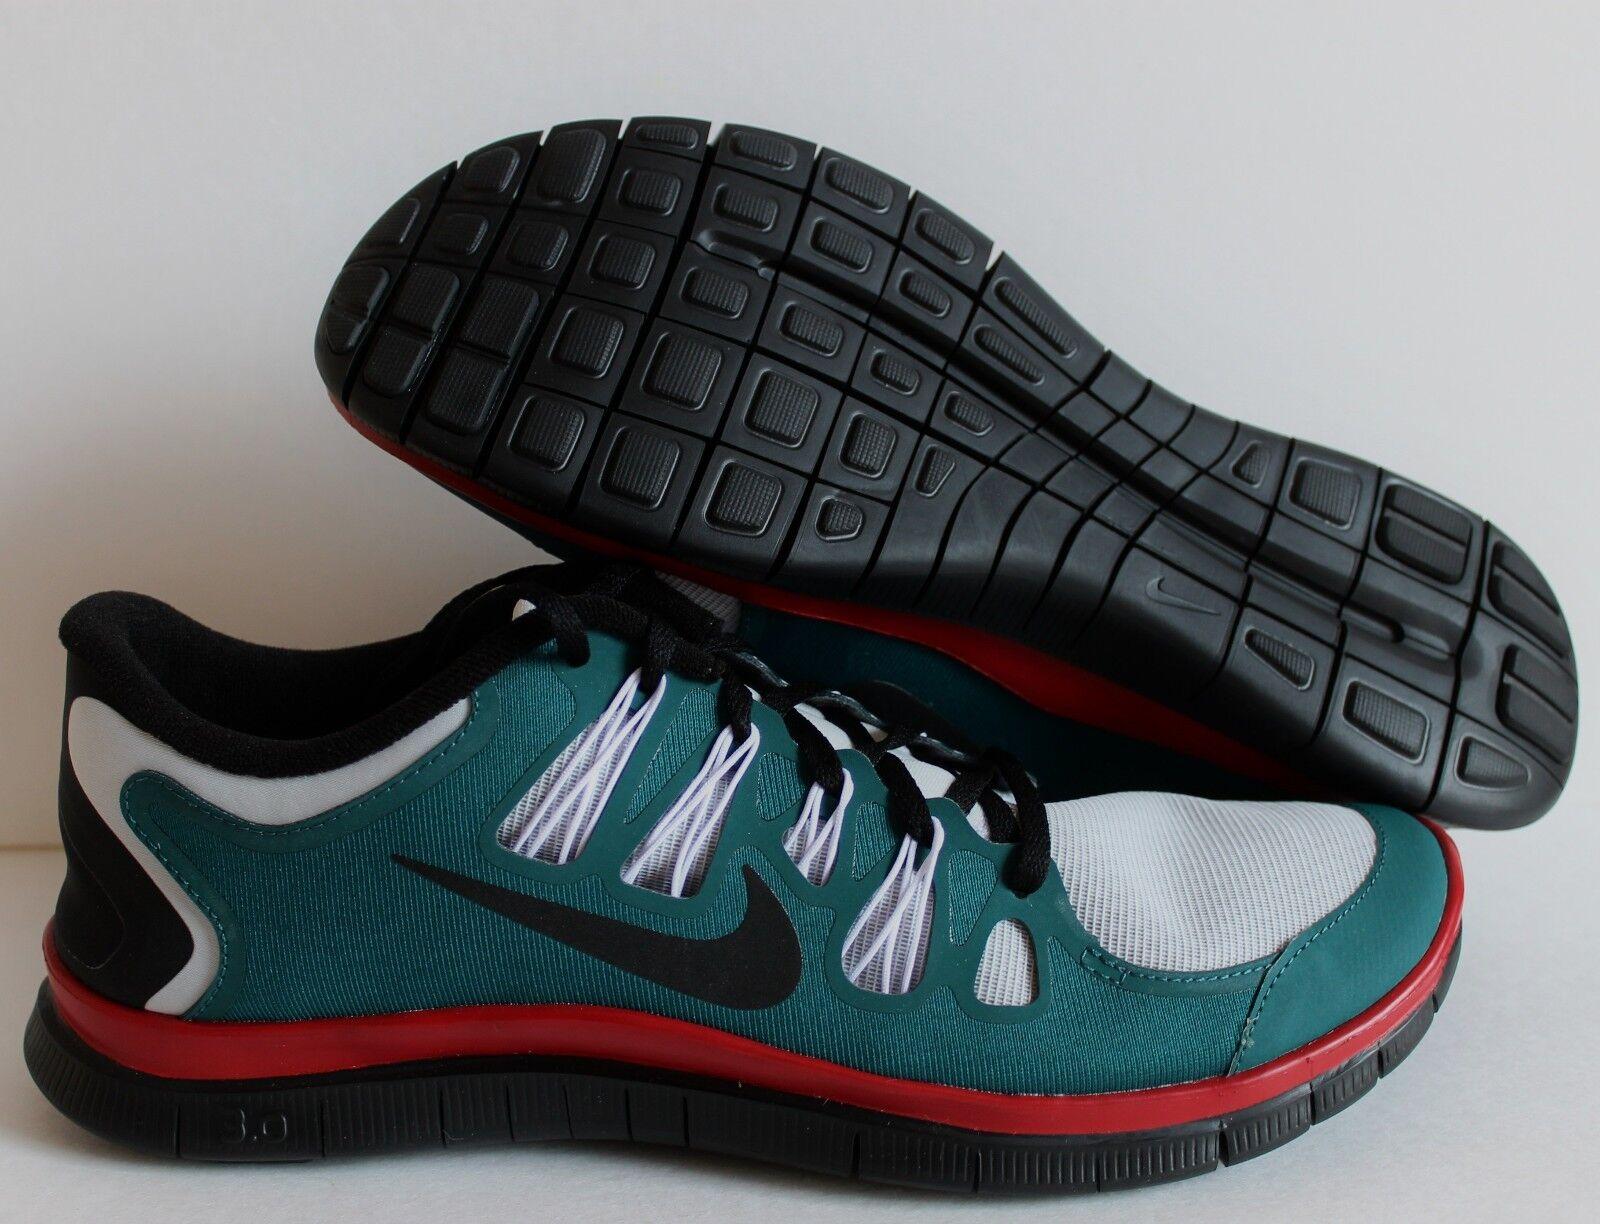 Nike Hombres Free 3.0 Verde-red-Negro 11,5 SZ 11,5 Verde-red-Negro 486045